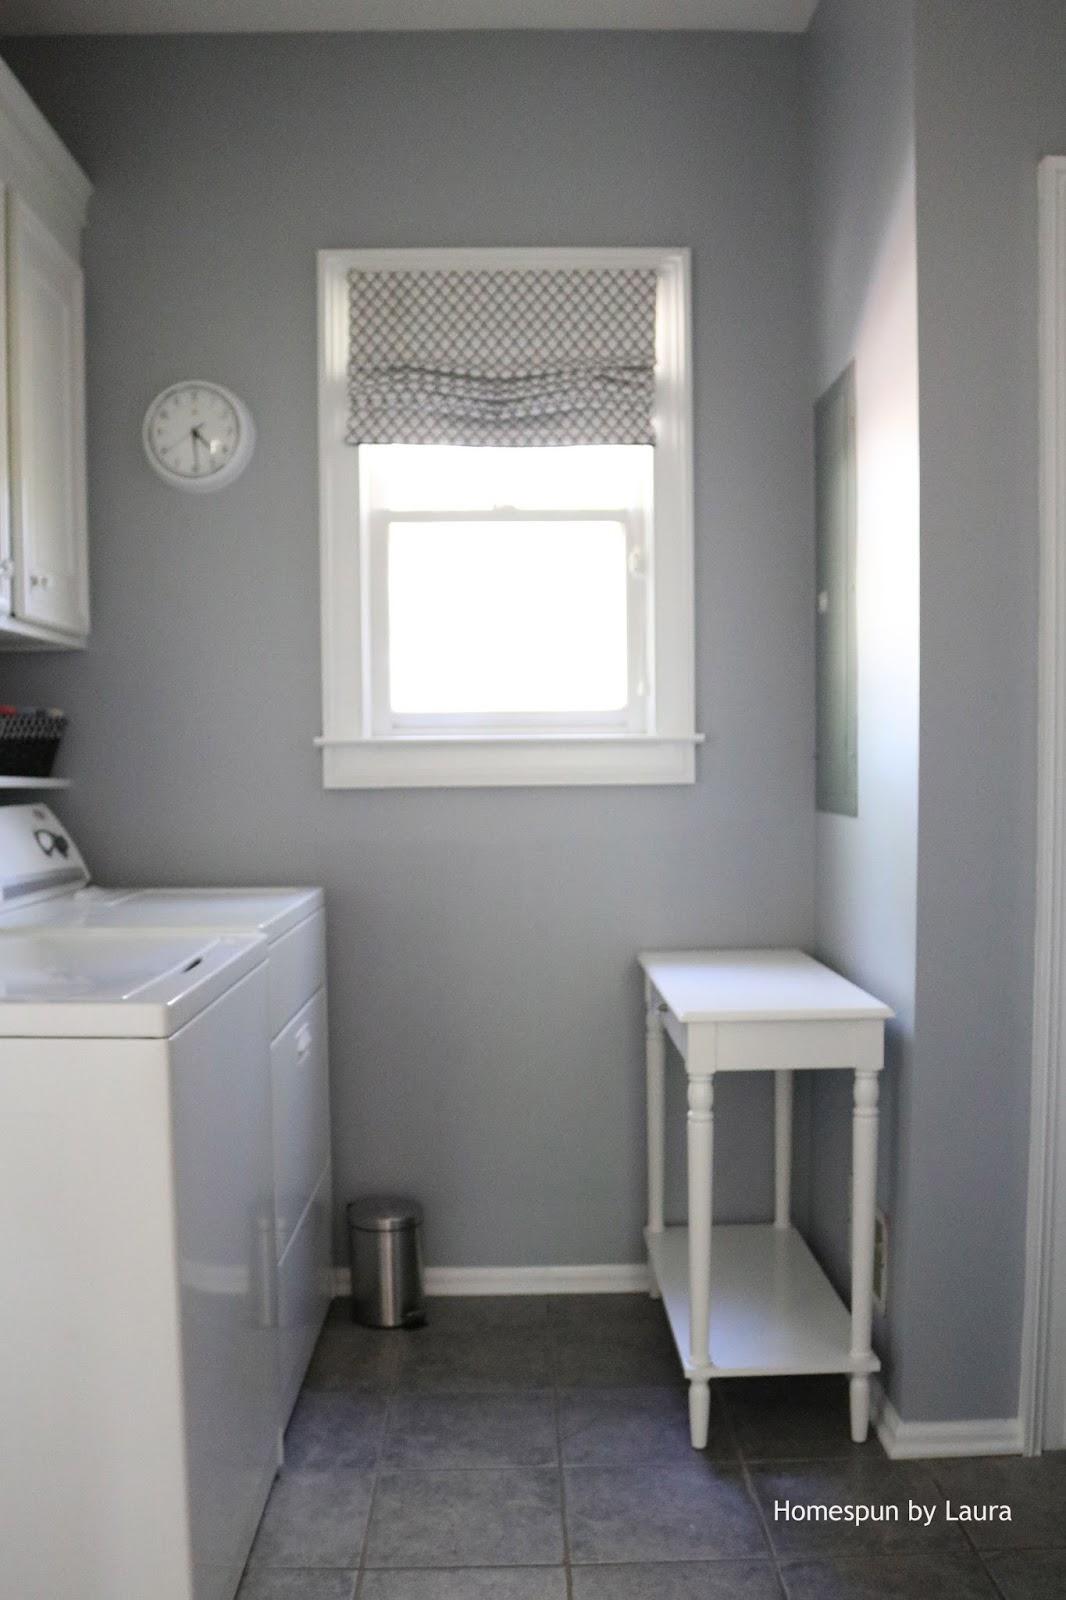 diy laundry rack / fuse box cover